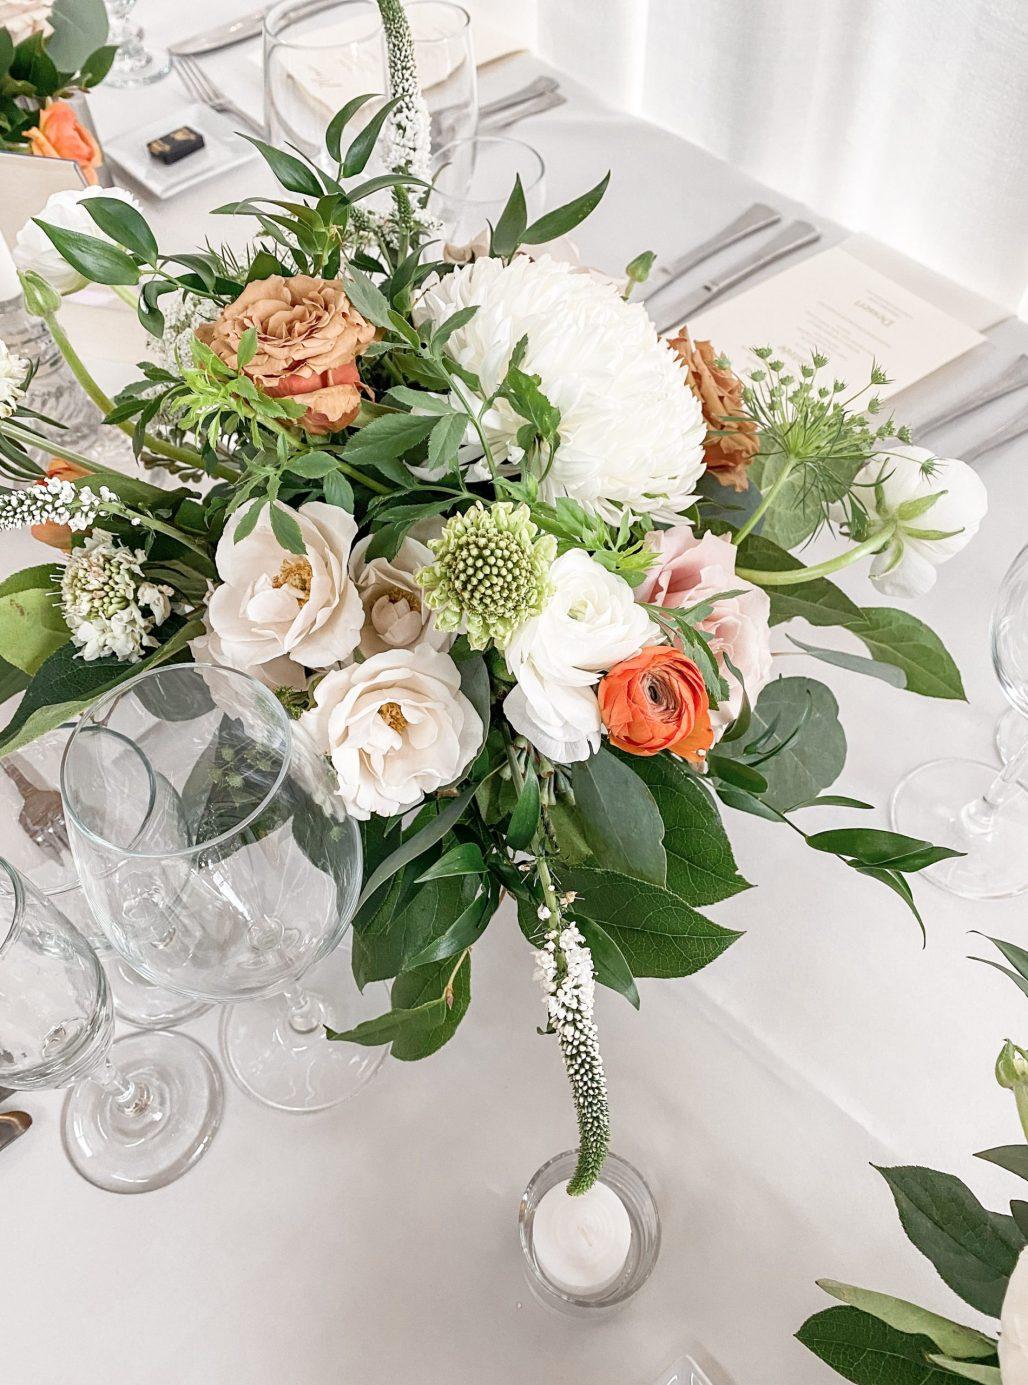 Thainara + Jose's Boho French Inspired Wedding Rich in Soft Earthy Hues || Dreamery Events